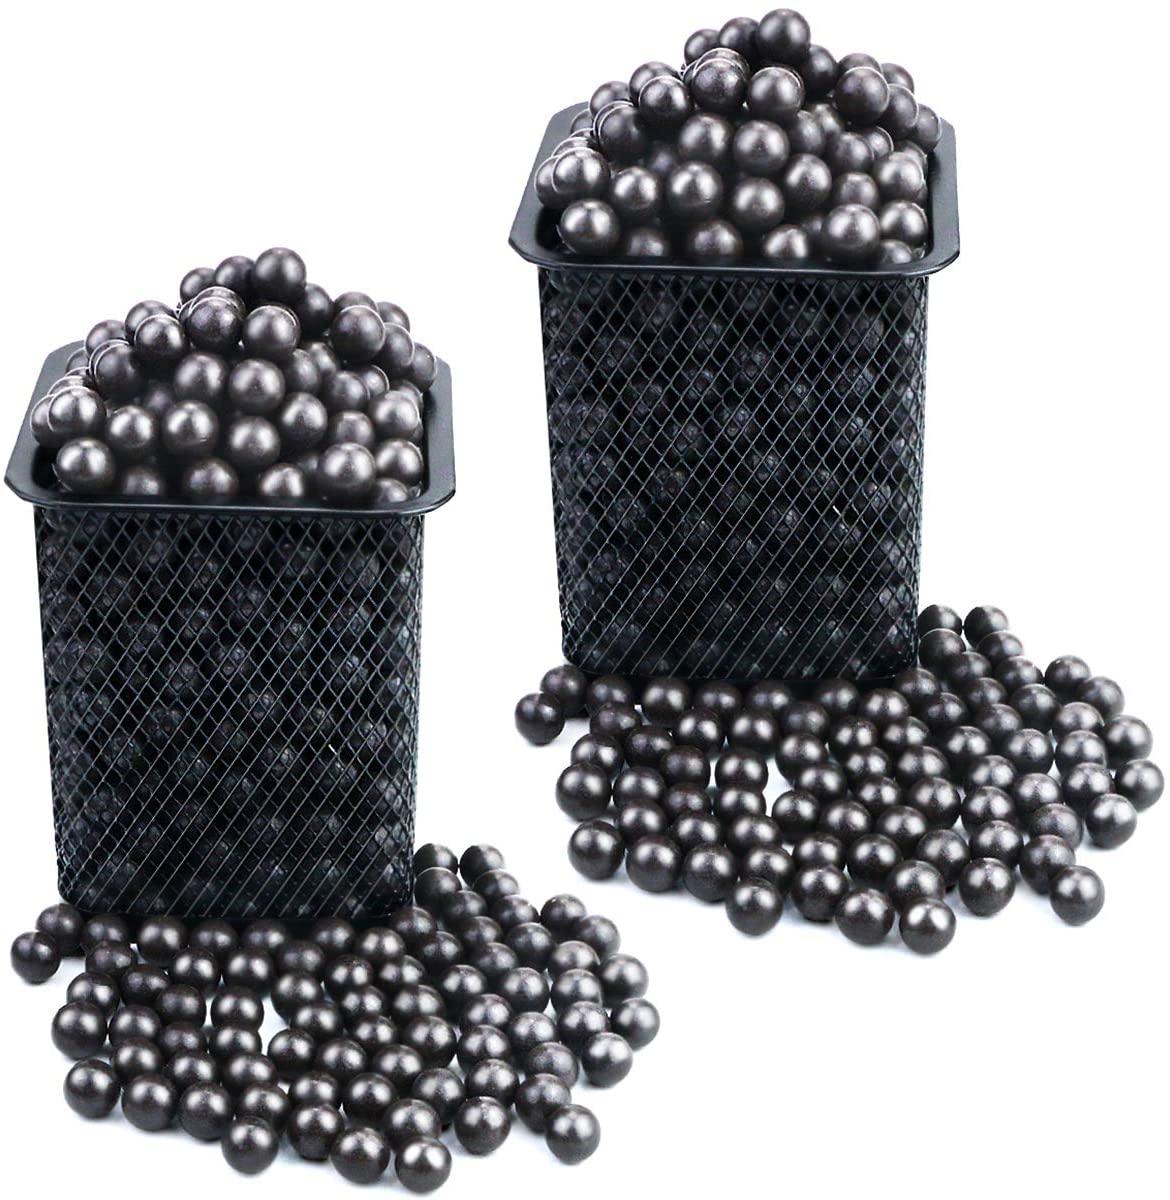 Weoxpr 1200 Pieces Biodegradable Slingshot Ammo Balls, 9-10mm Hard Slingshot Clay Ammo, Dark Brown